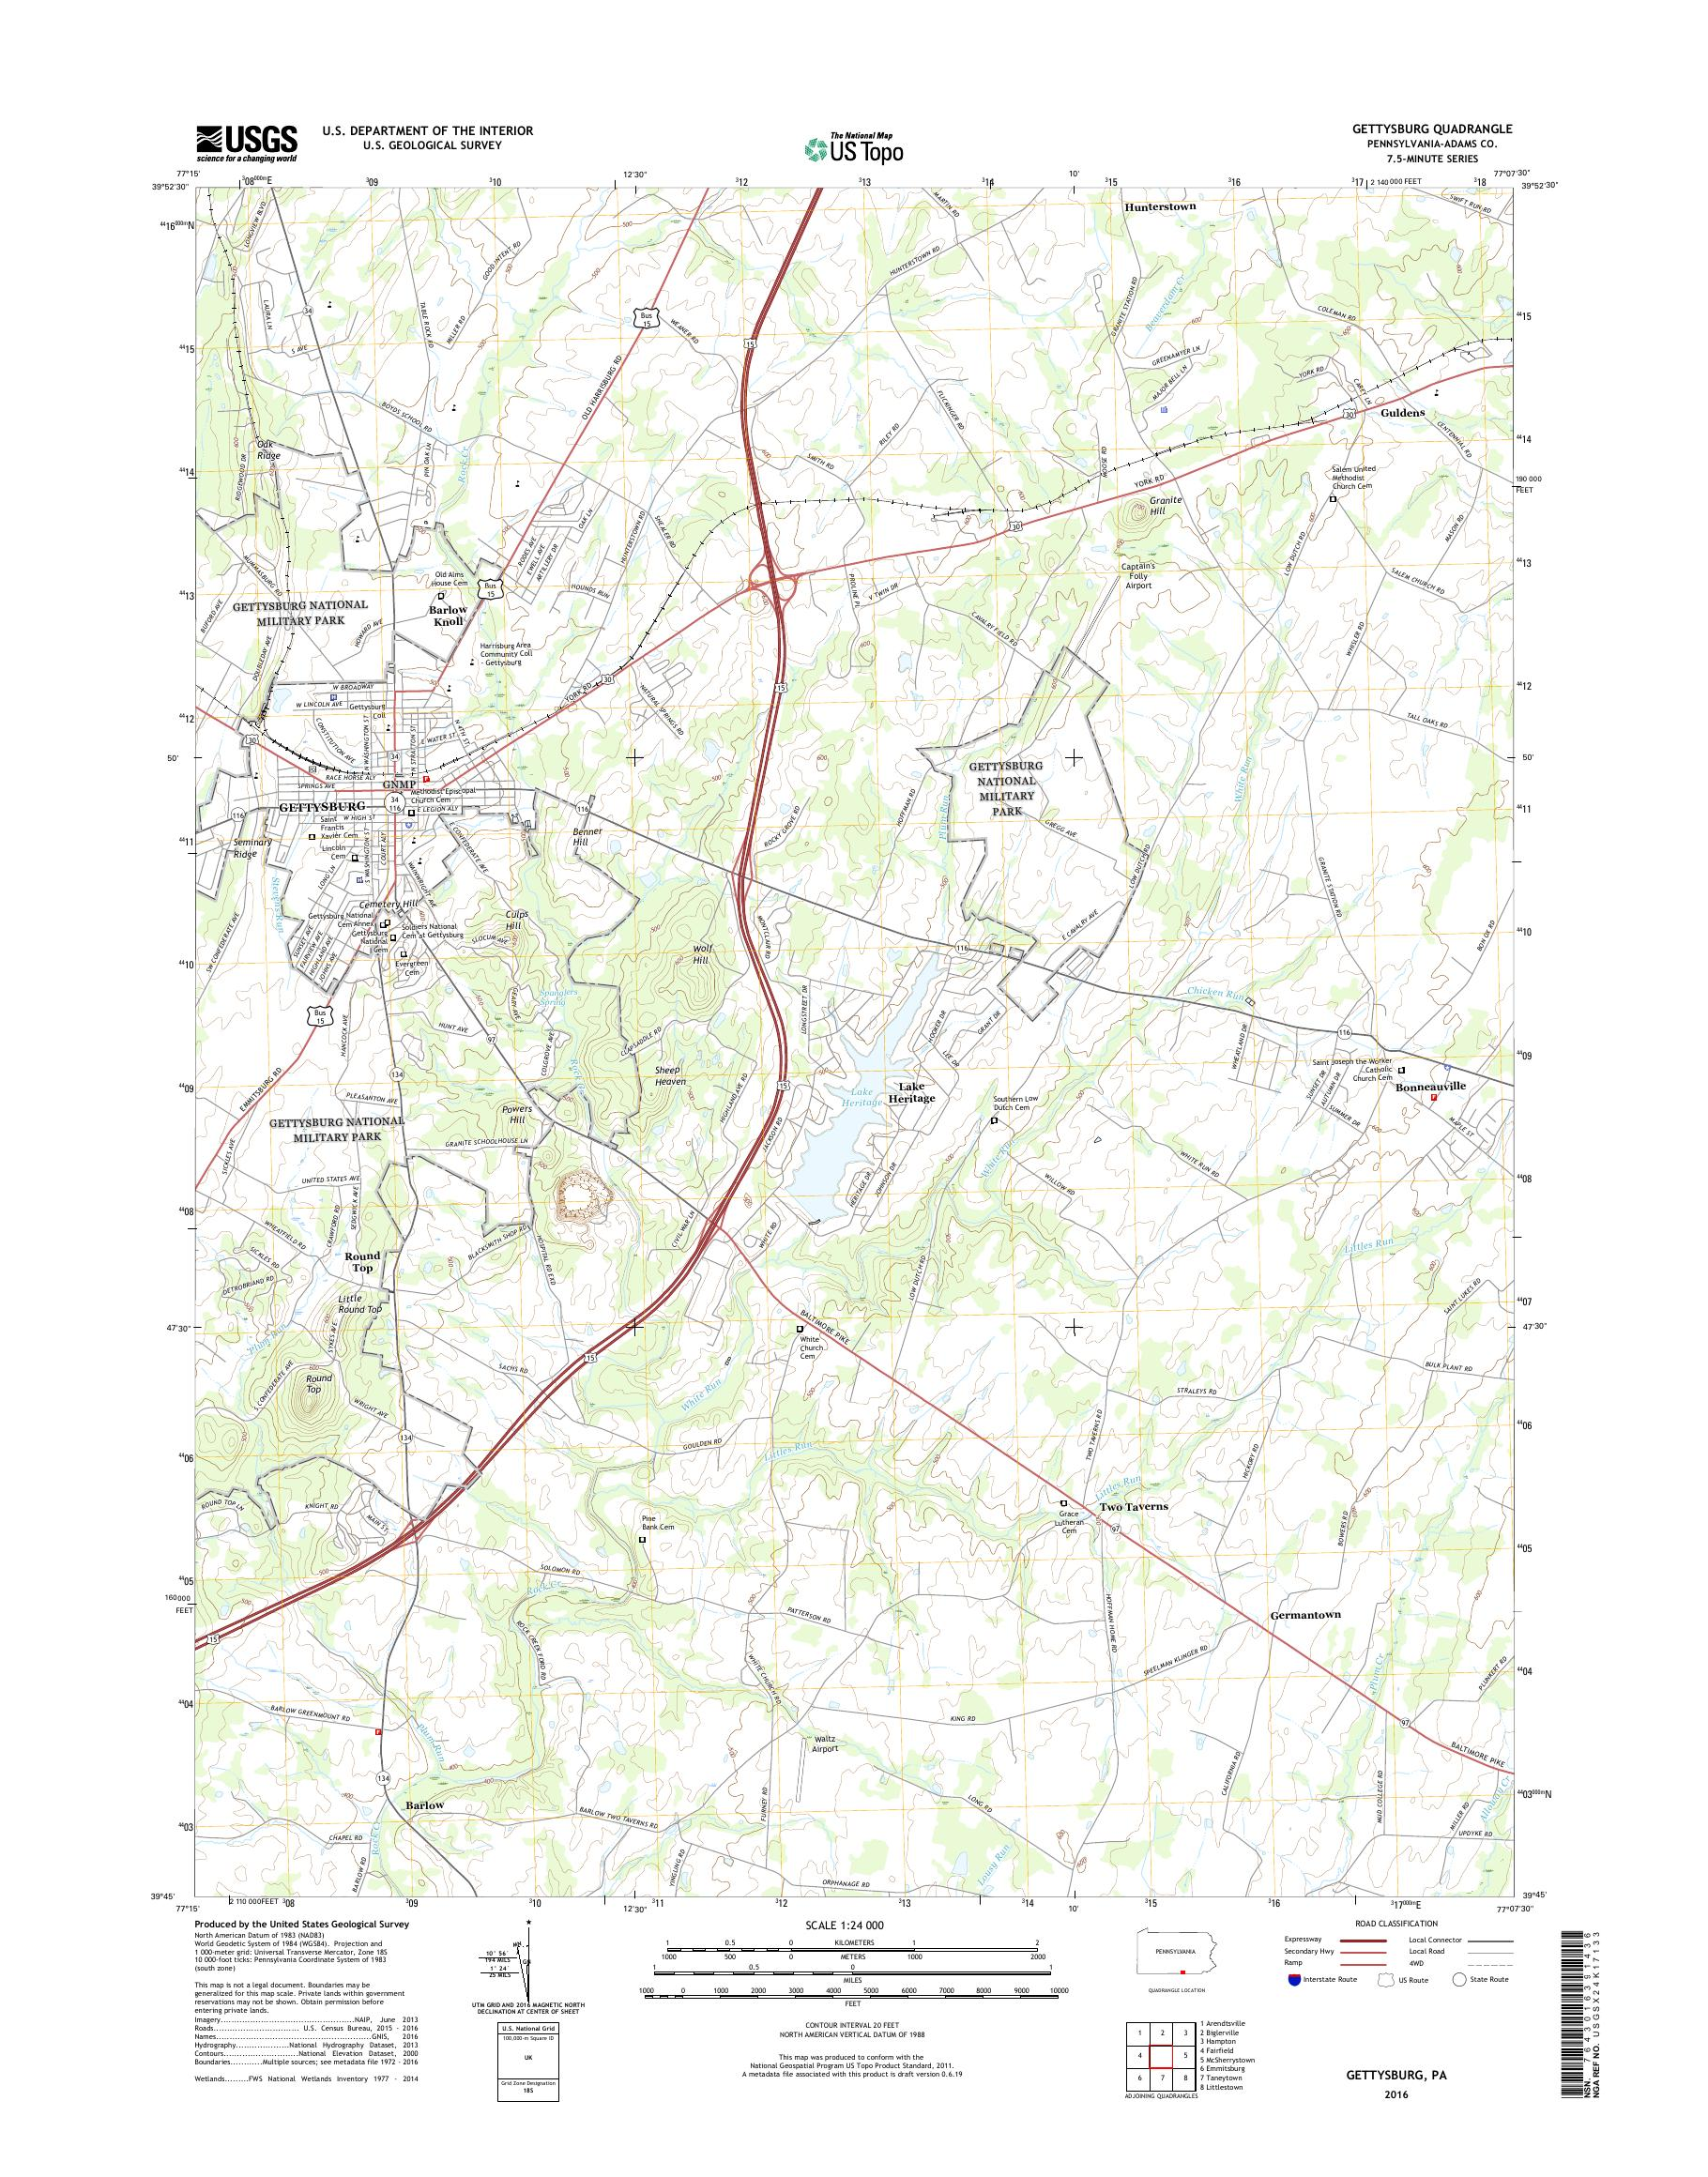 Mytopo Gettysburg Pennsylvania Usgs Quad Topo Map - Gettysburg-on-us-map